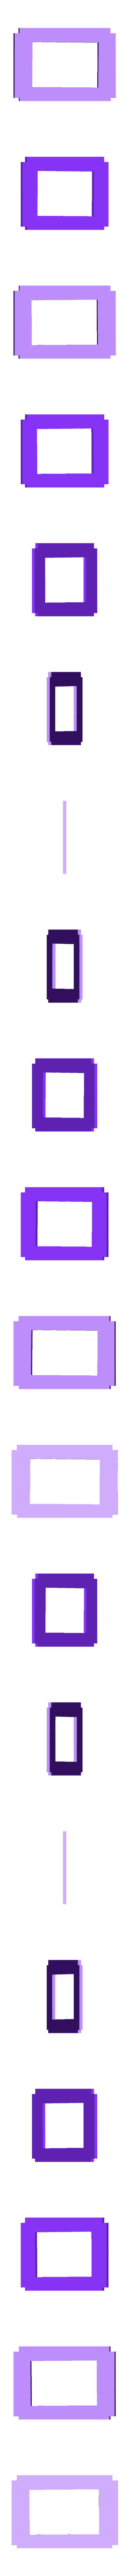 WATERTANK_4.stl Download free STL file FISH TANK FUNKO POP OR PEGGYBANK • 3D printer template, gaaraa